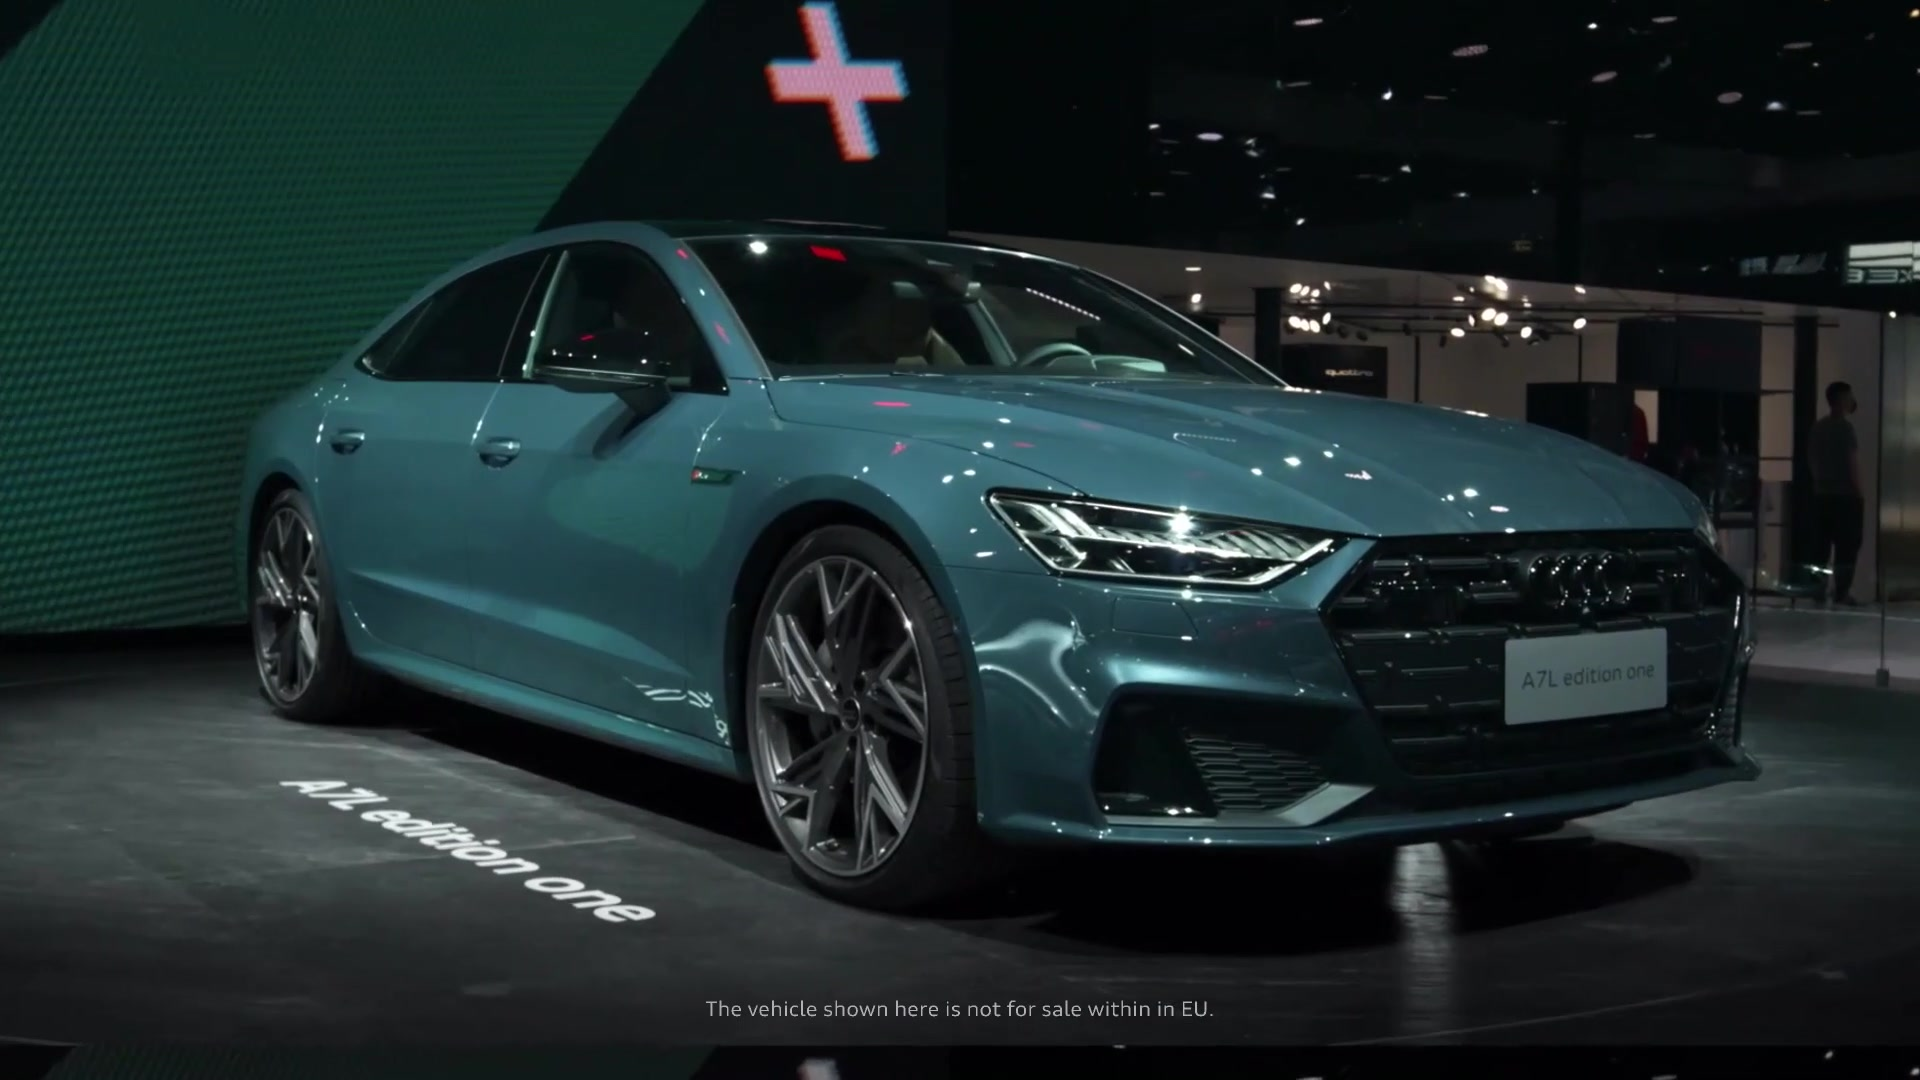 Audi Media Days - Corporate & Business - Part 3